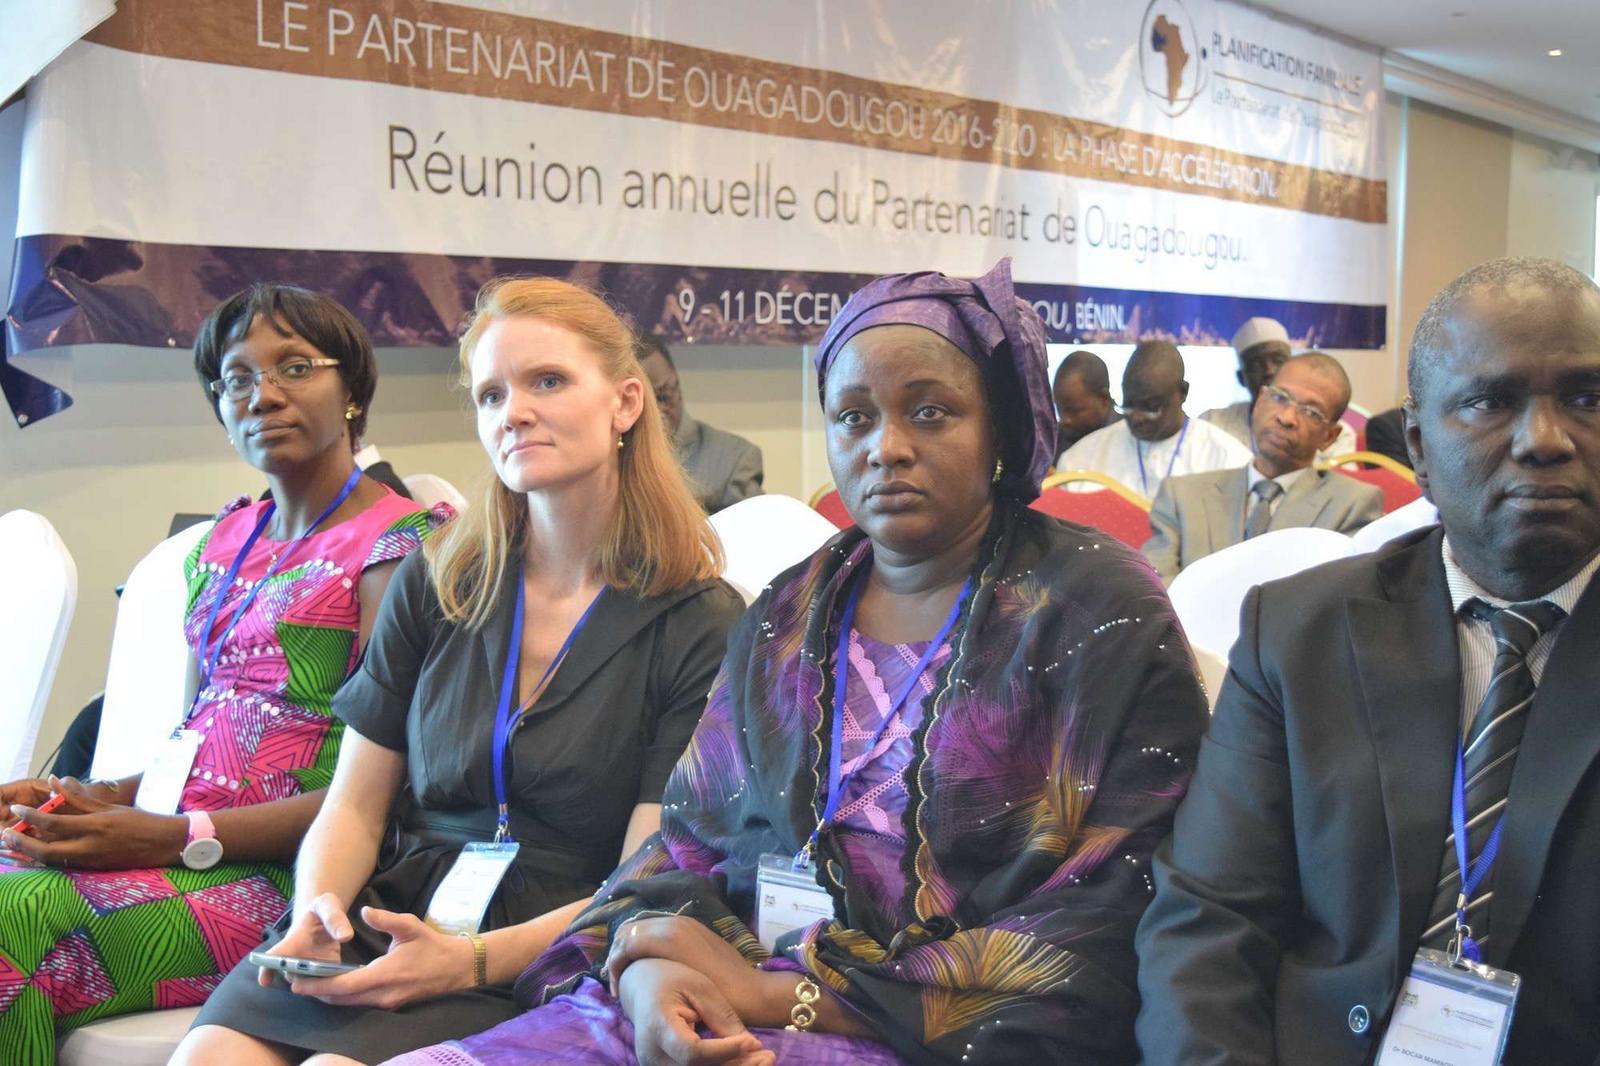 ouagadougou partnership holds  annual meeting dec     abidjan cote divoire